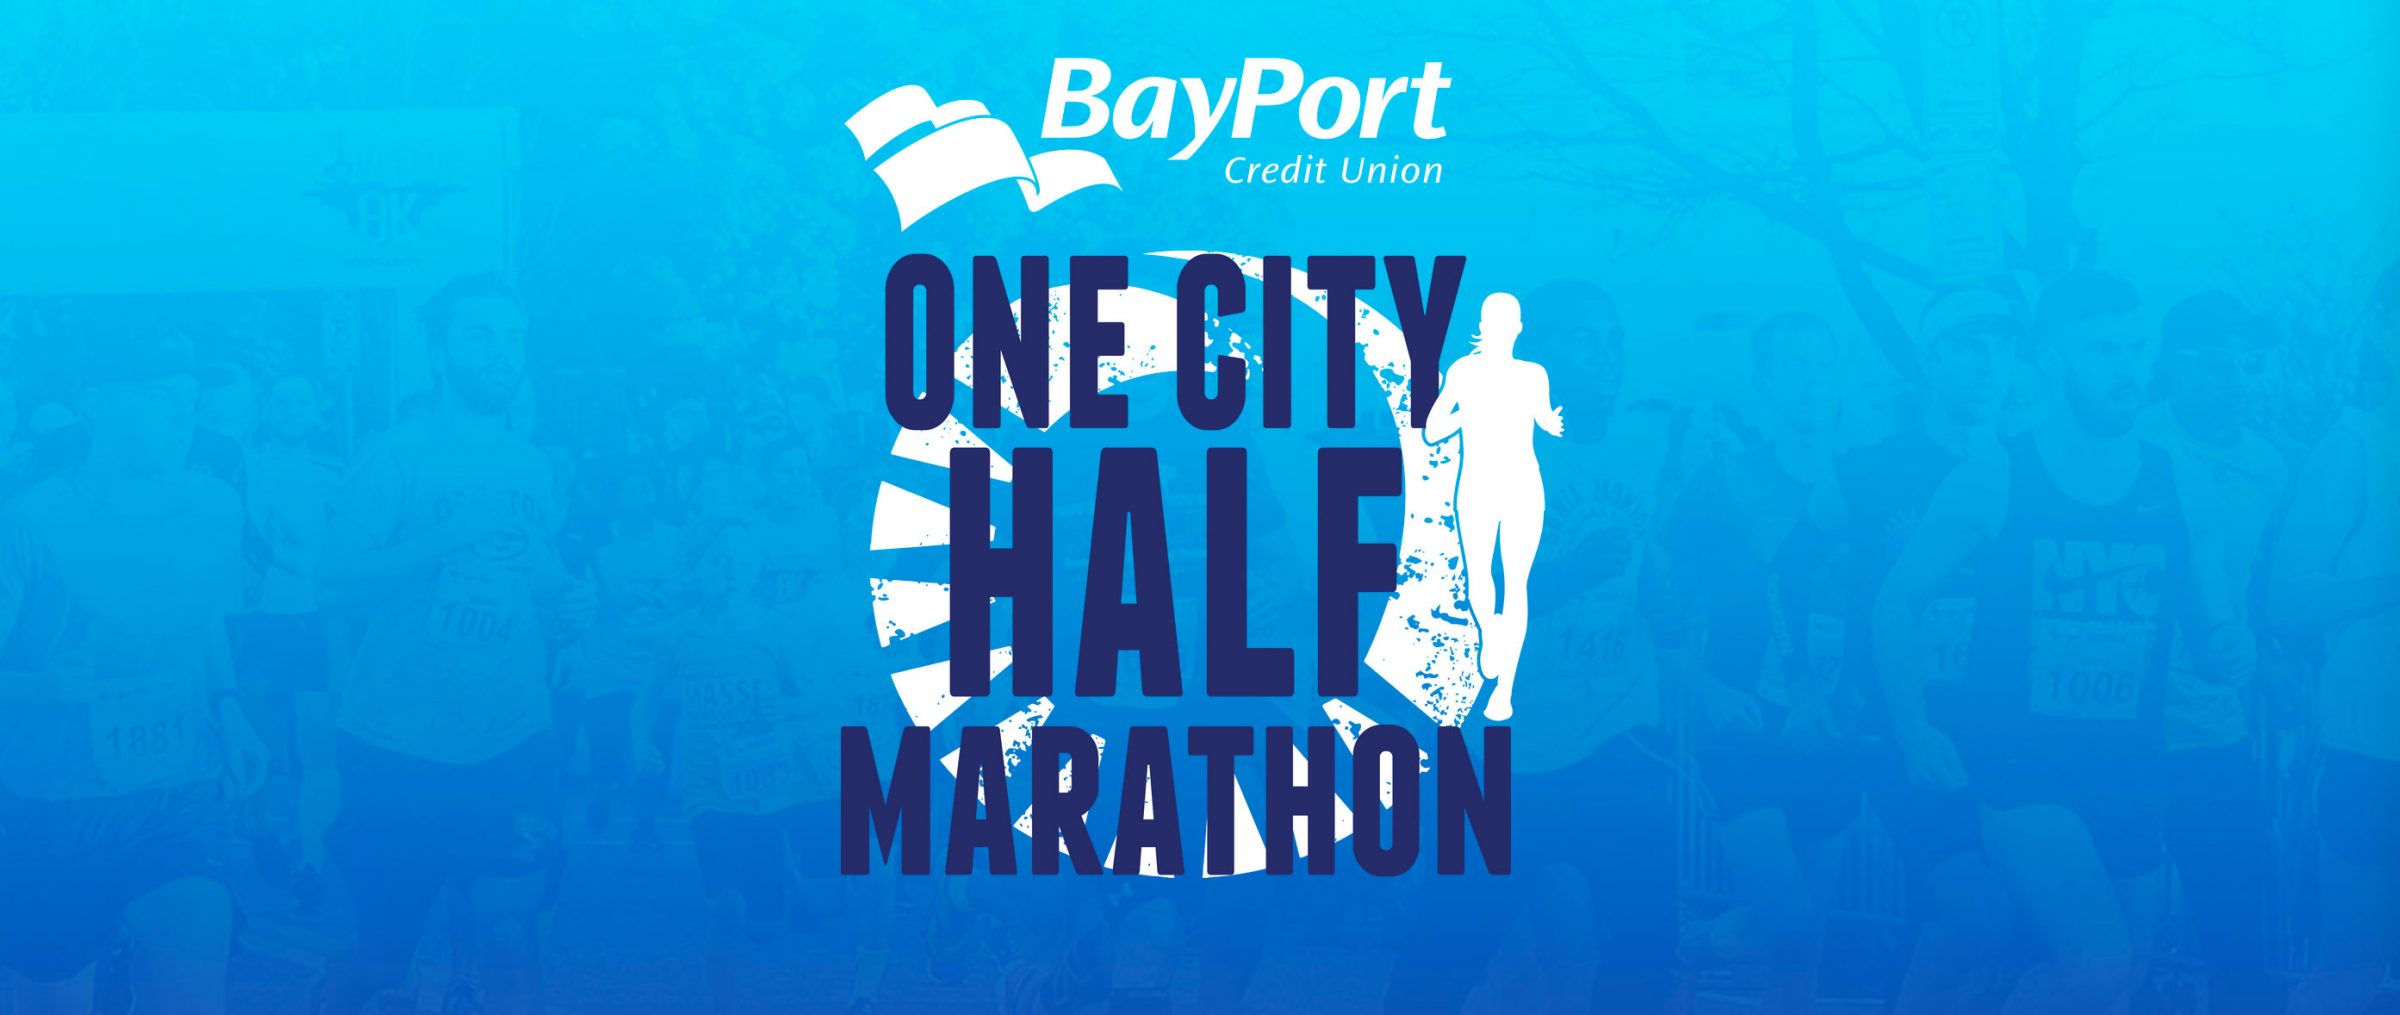 one city half marathon